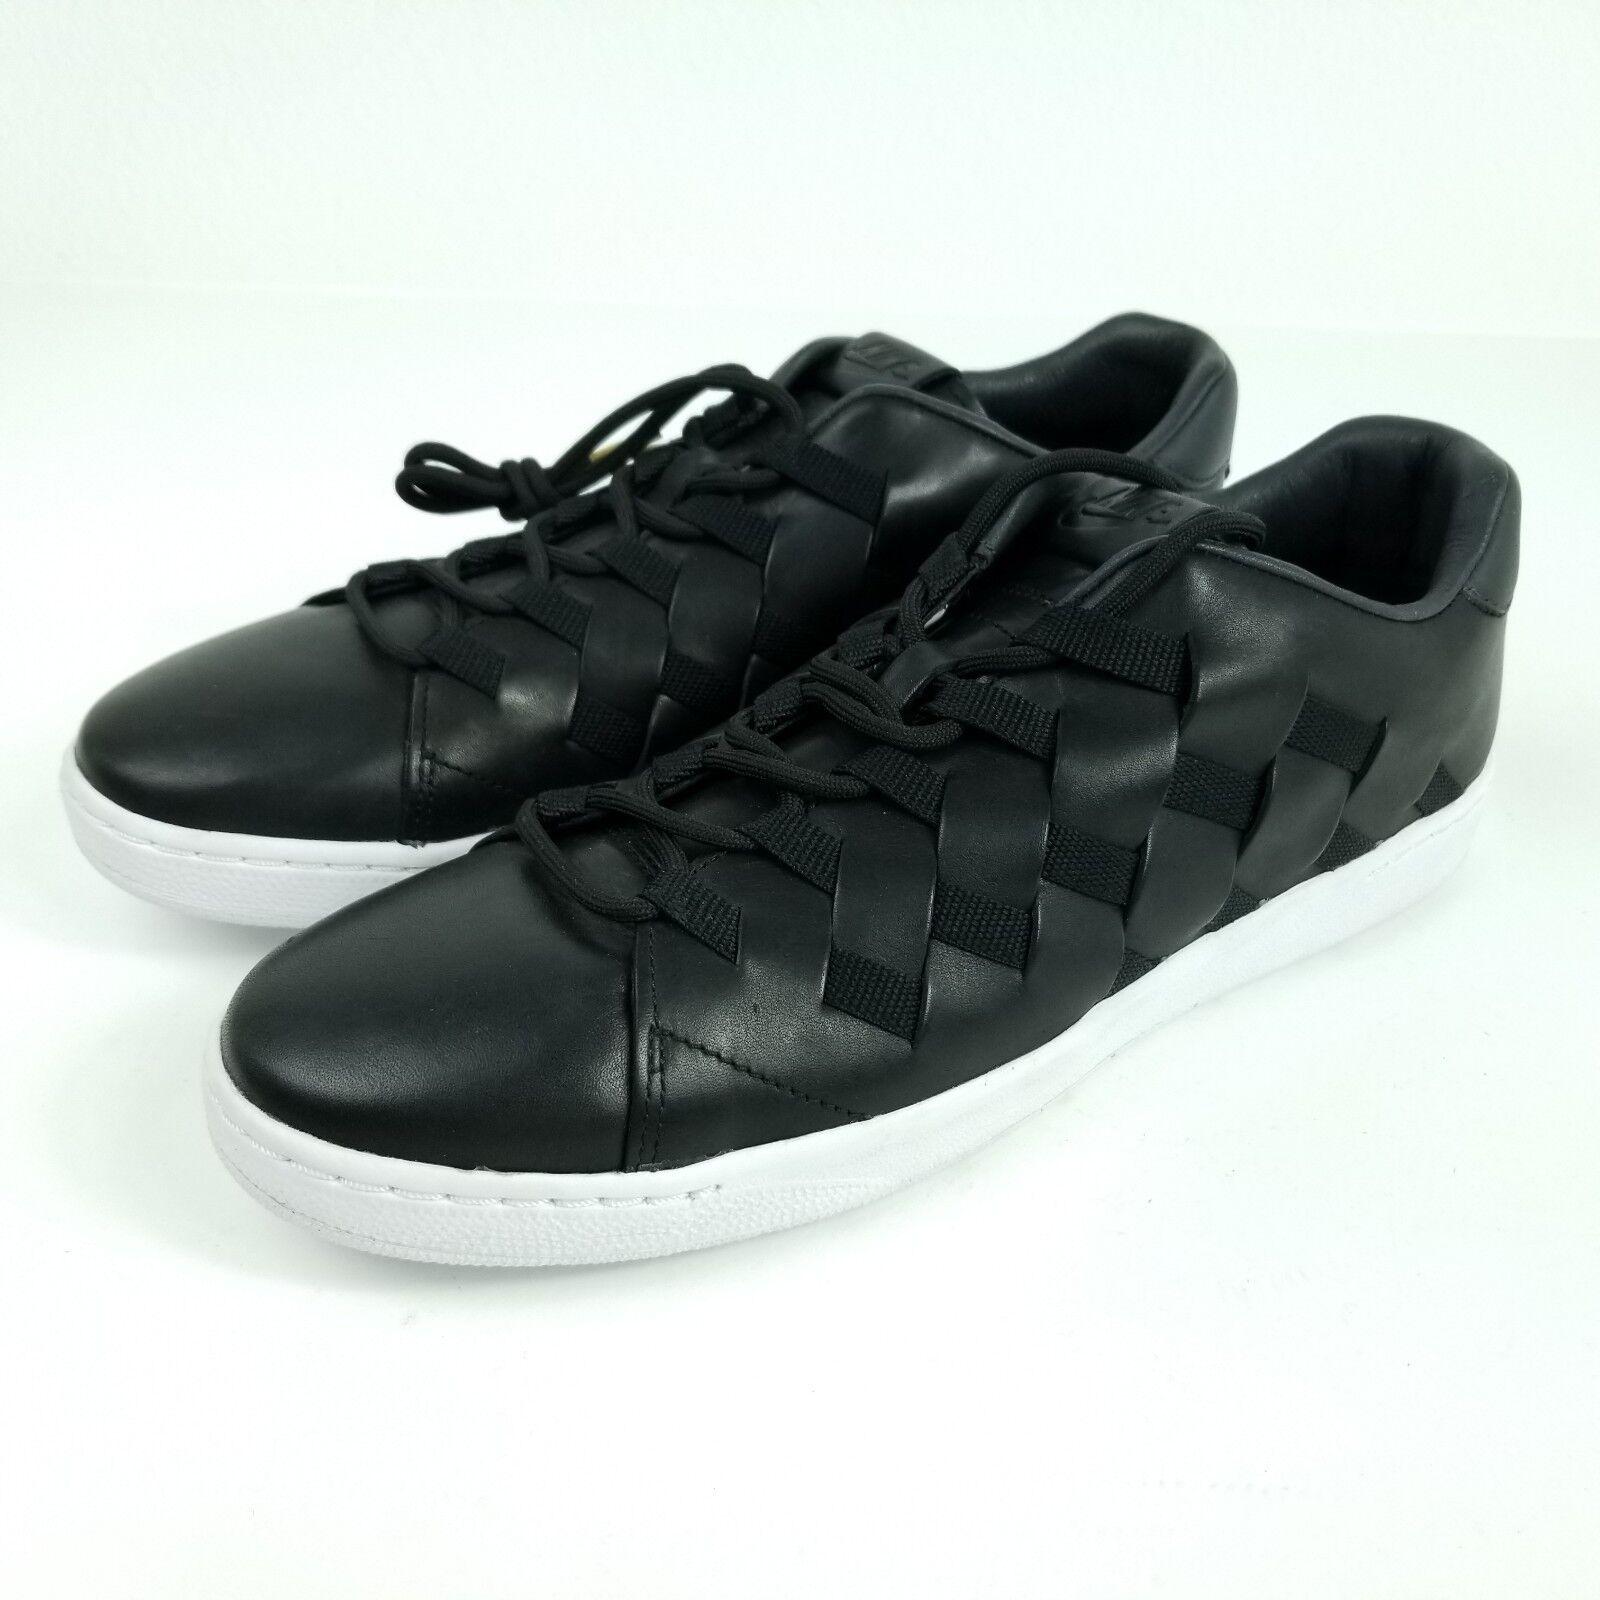 NIKE Tennis Classic Ultra PRM QS Premium Woven Mens 11.5 Shoes Black 830699 002